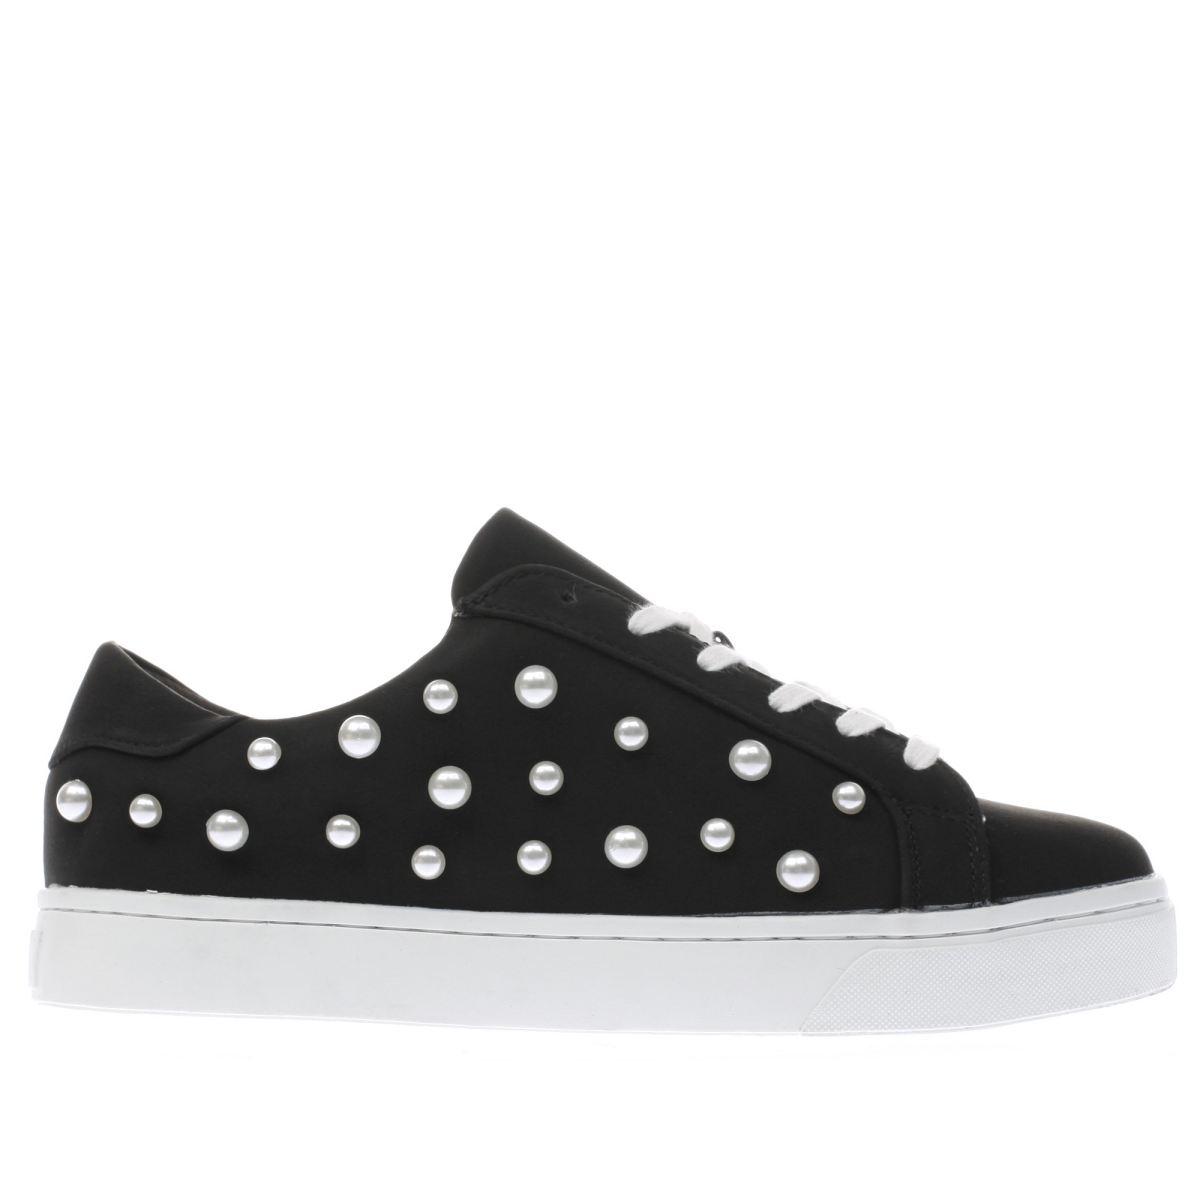 schuh black sprinkle flat shoes